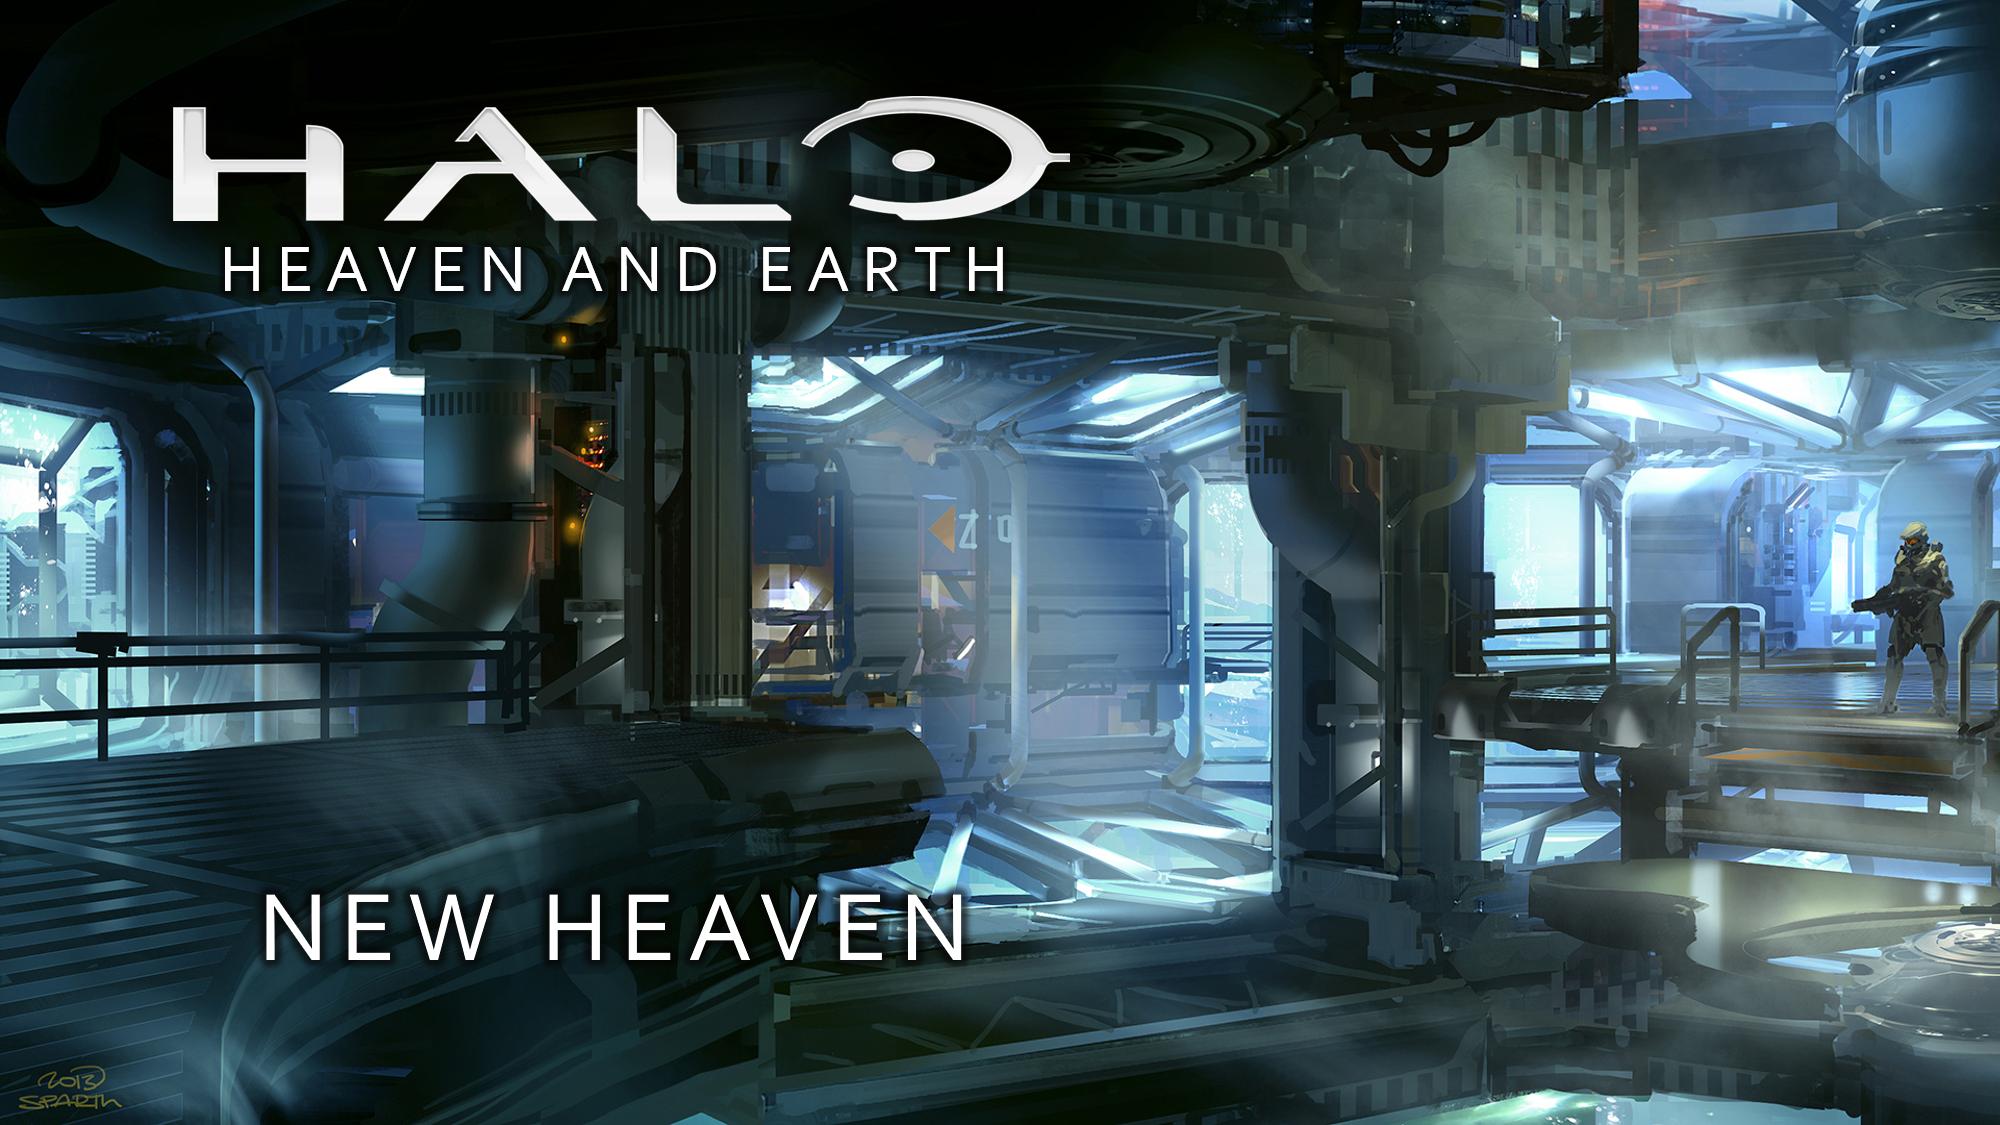 Halo: Heaven and Earth/Book One: New Heaven